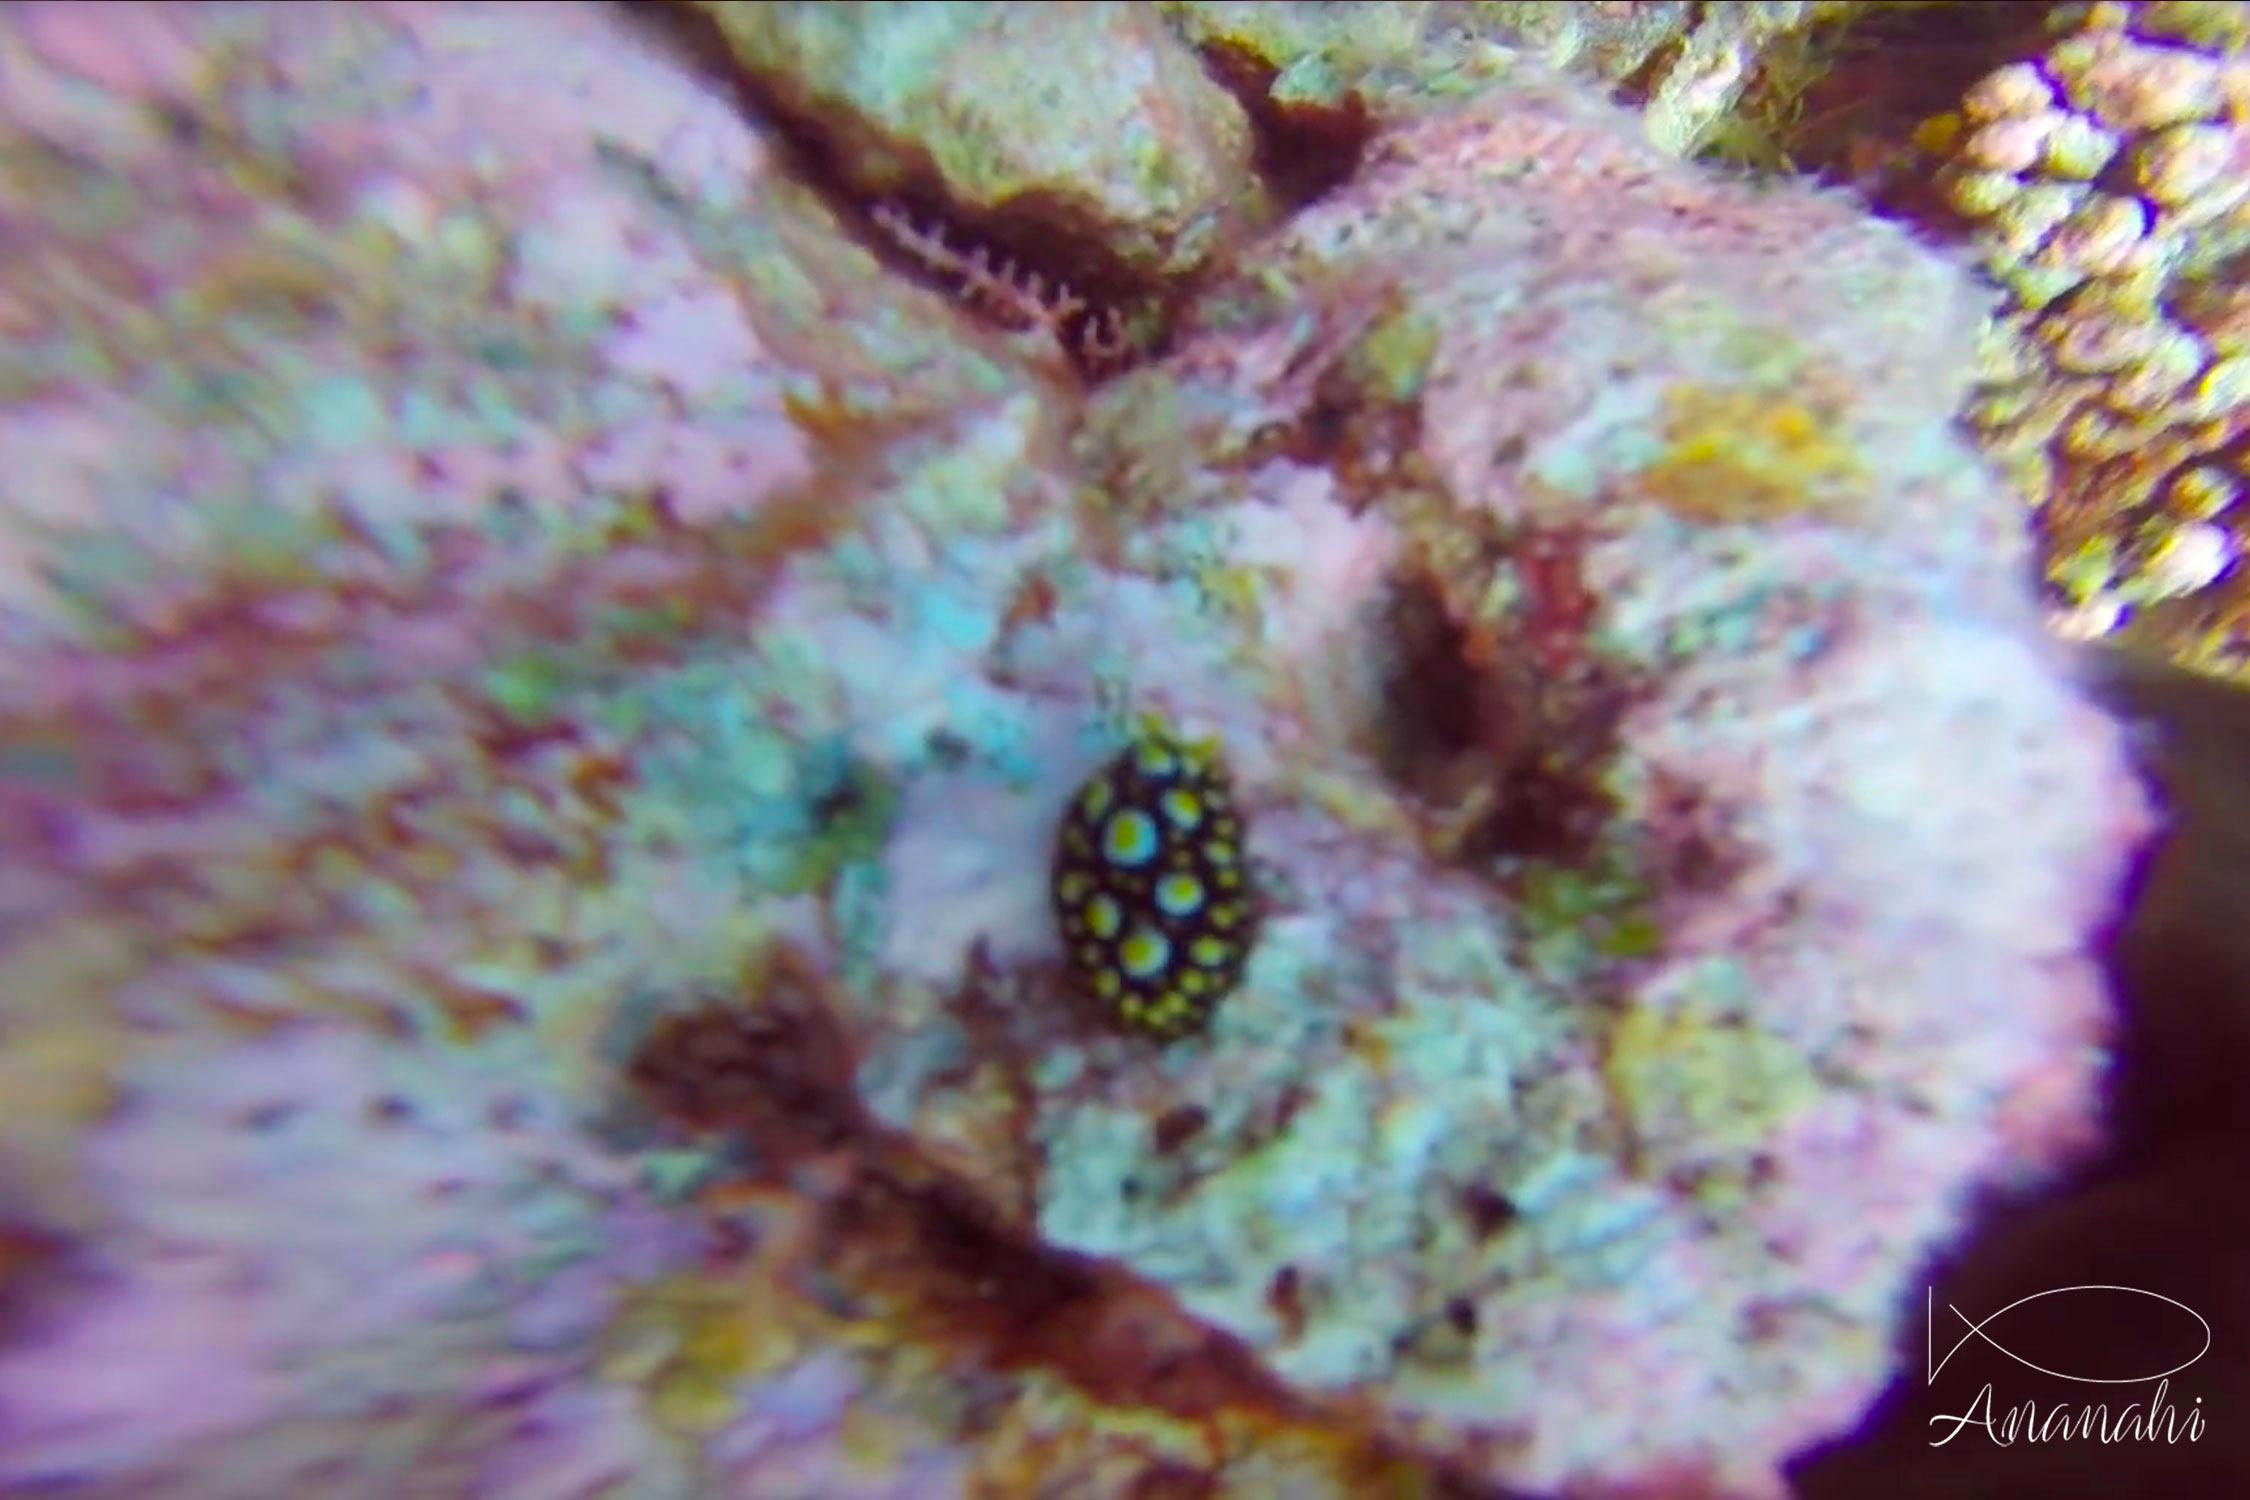 Phyllidie tula de Polynésie française